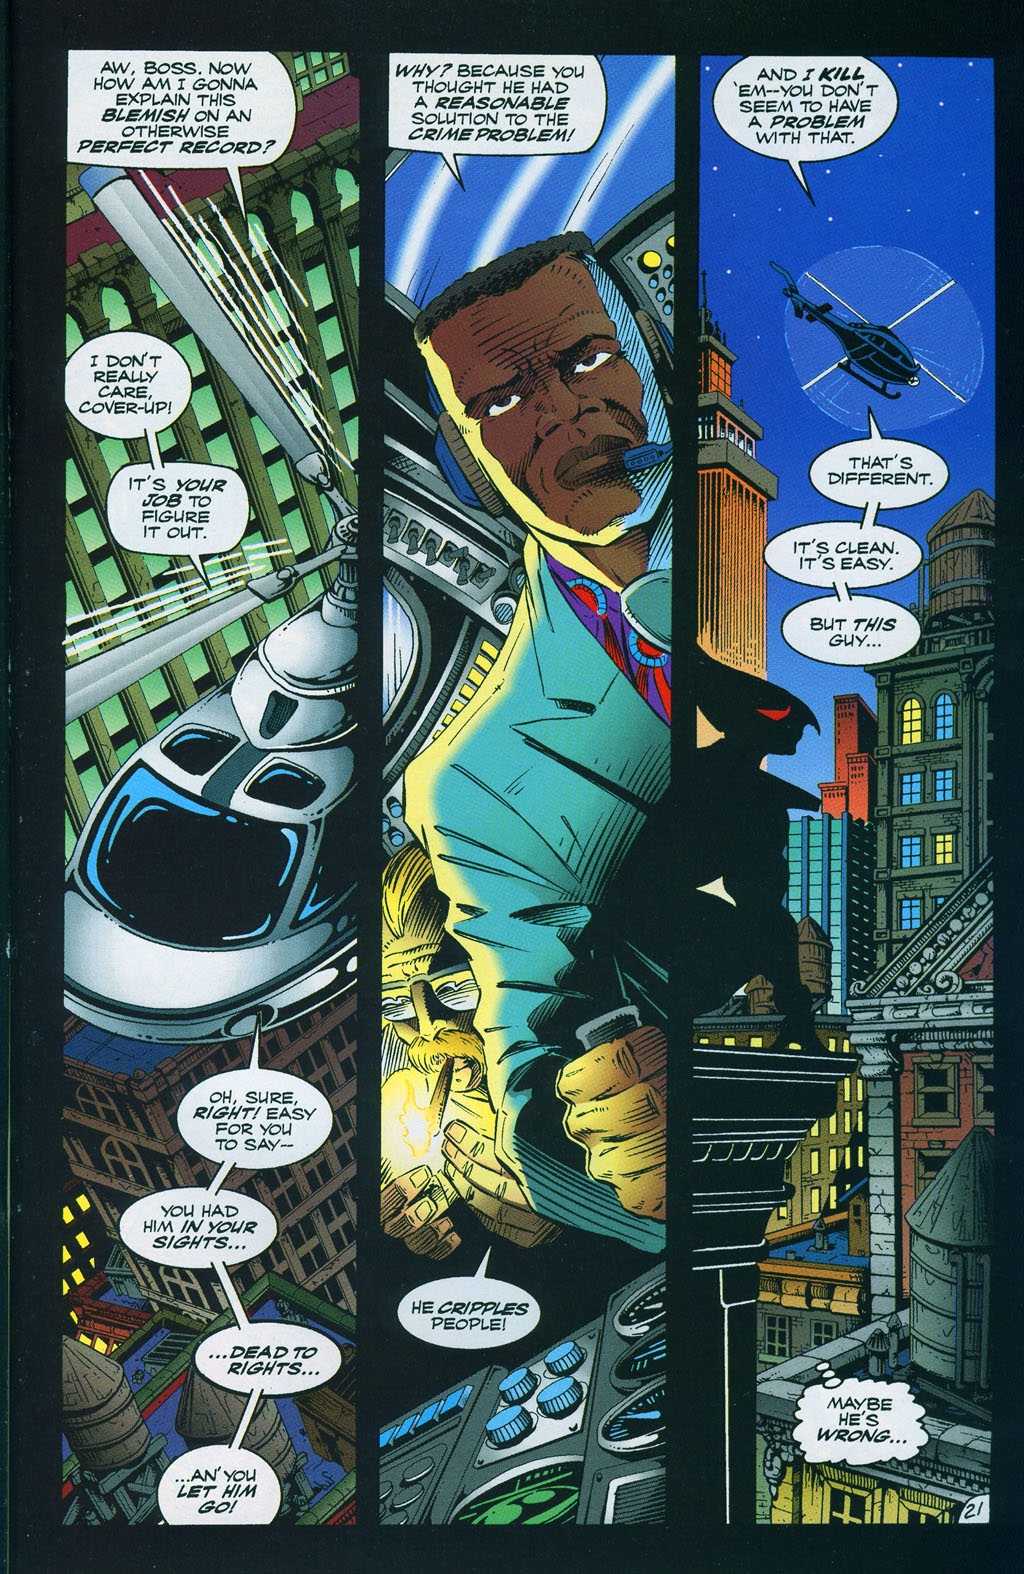 Read online ShadowHawk comic -  Issue #7 - 28